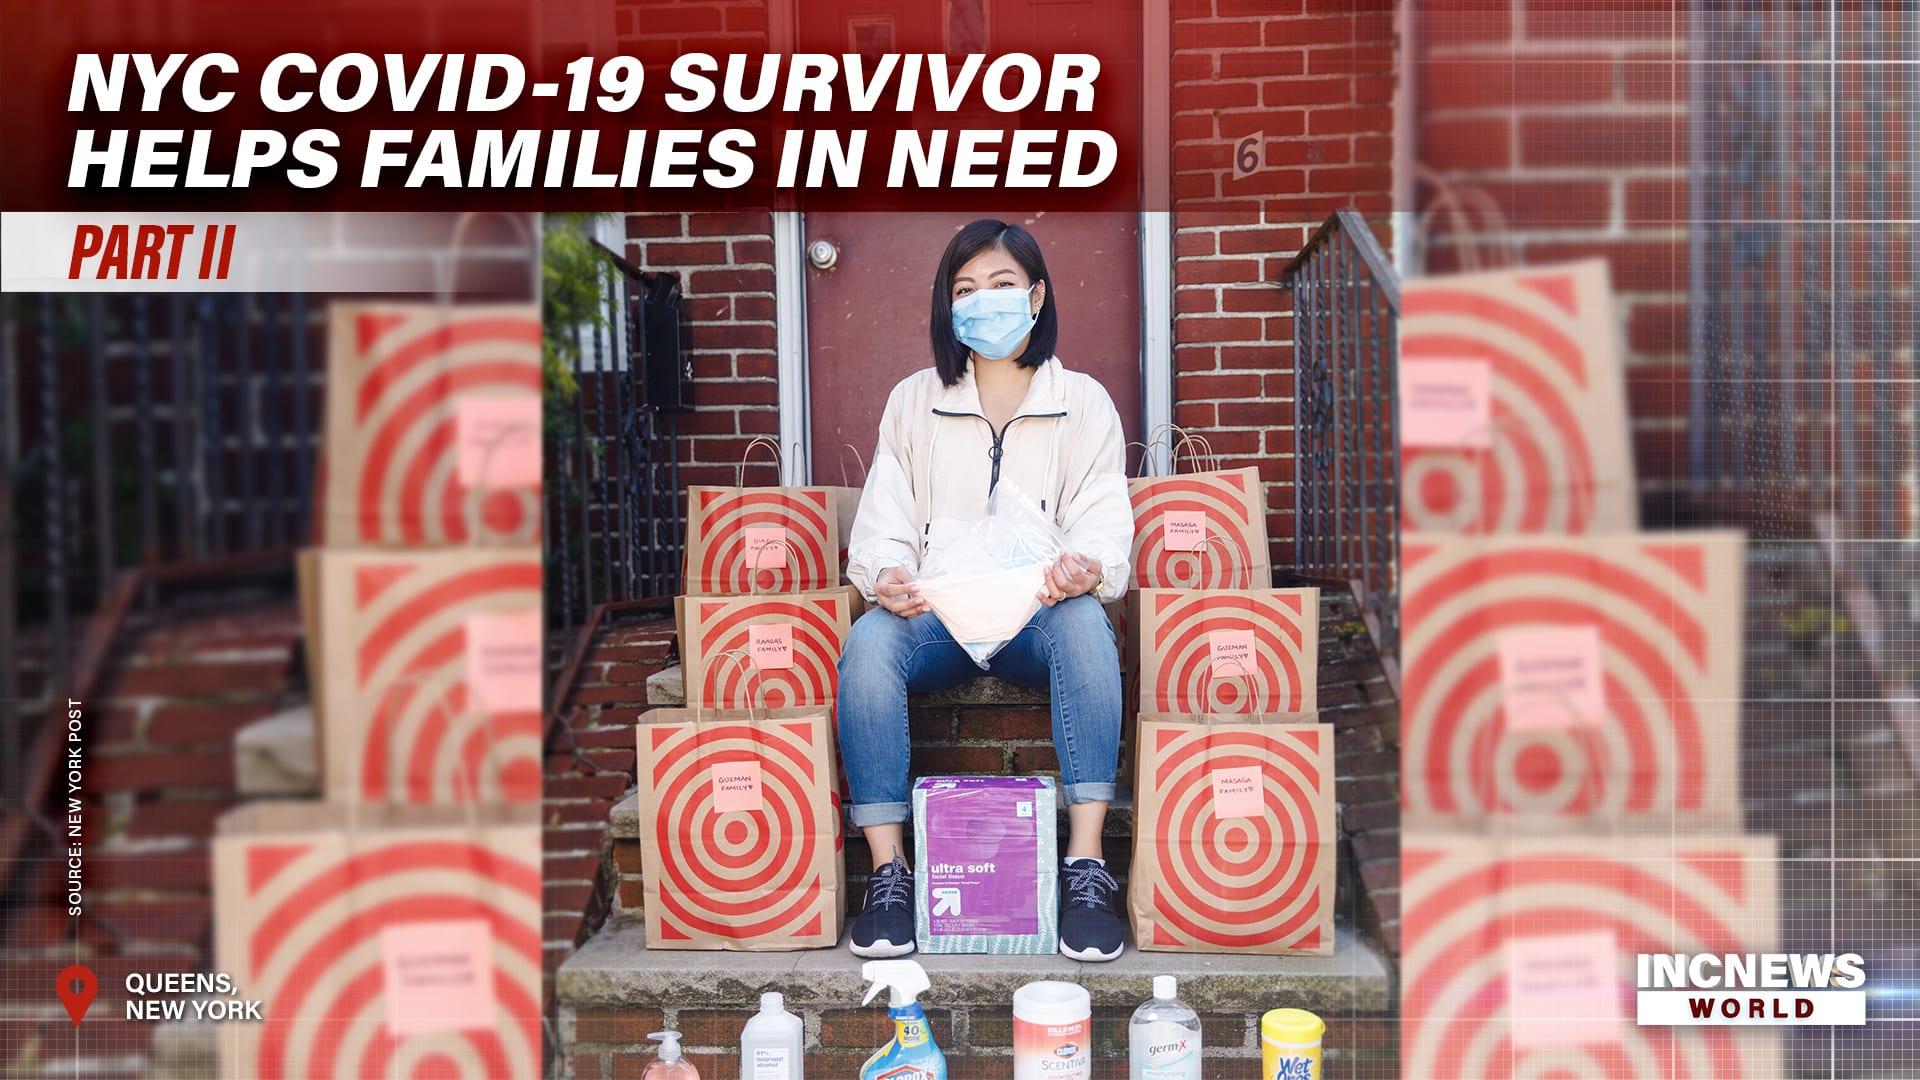 NYC COVID-19 Survivor Helps Families in Need